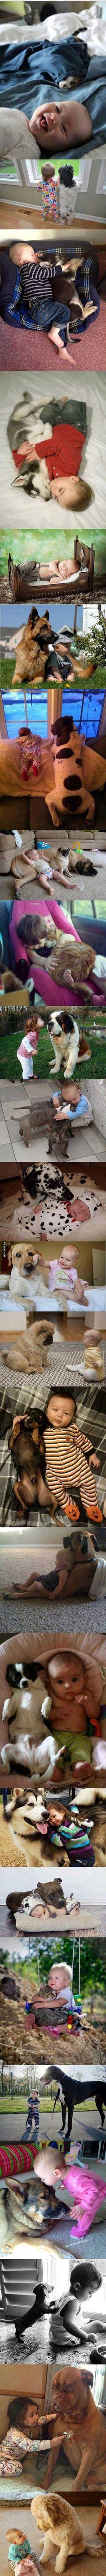 Why kids need pets.( 26 Pics)!: